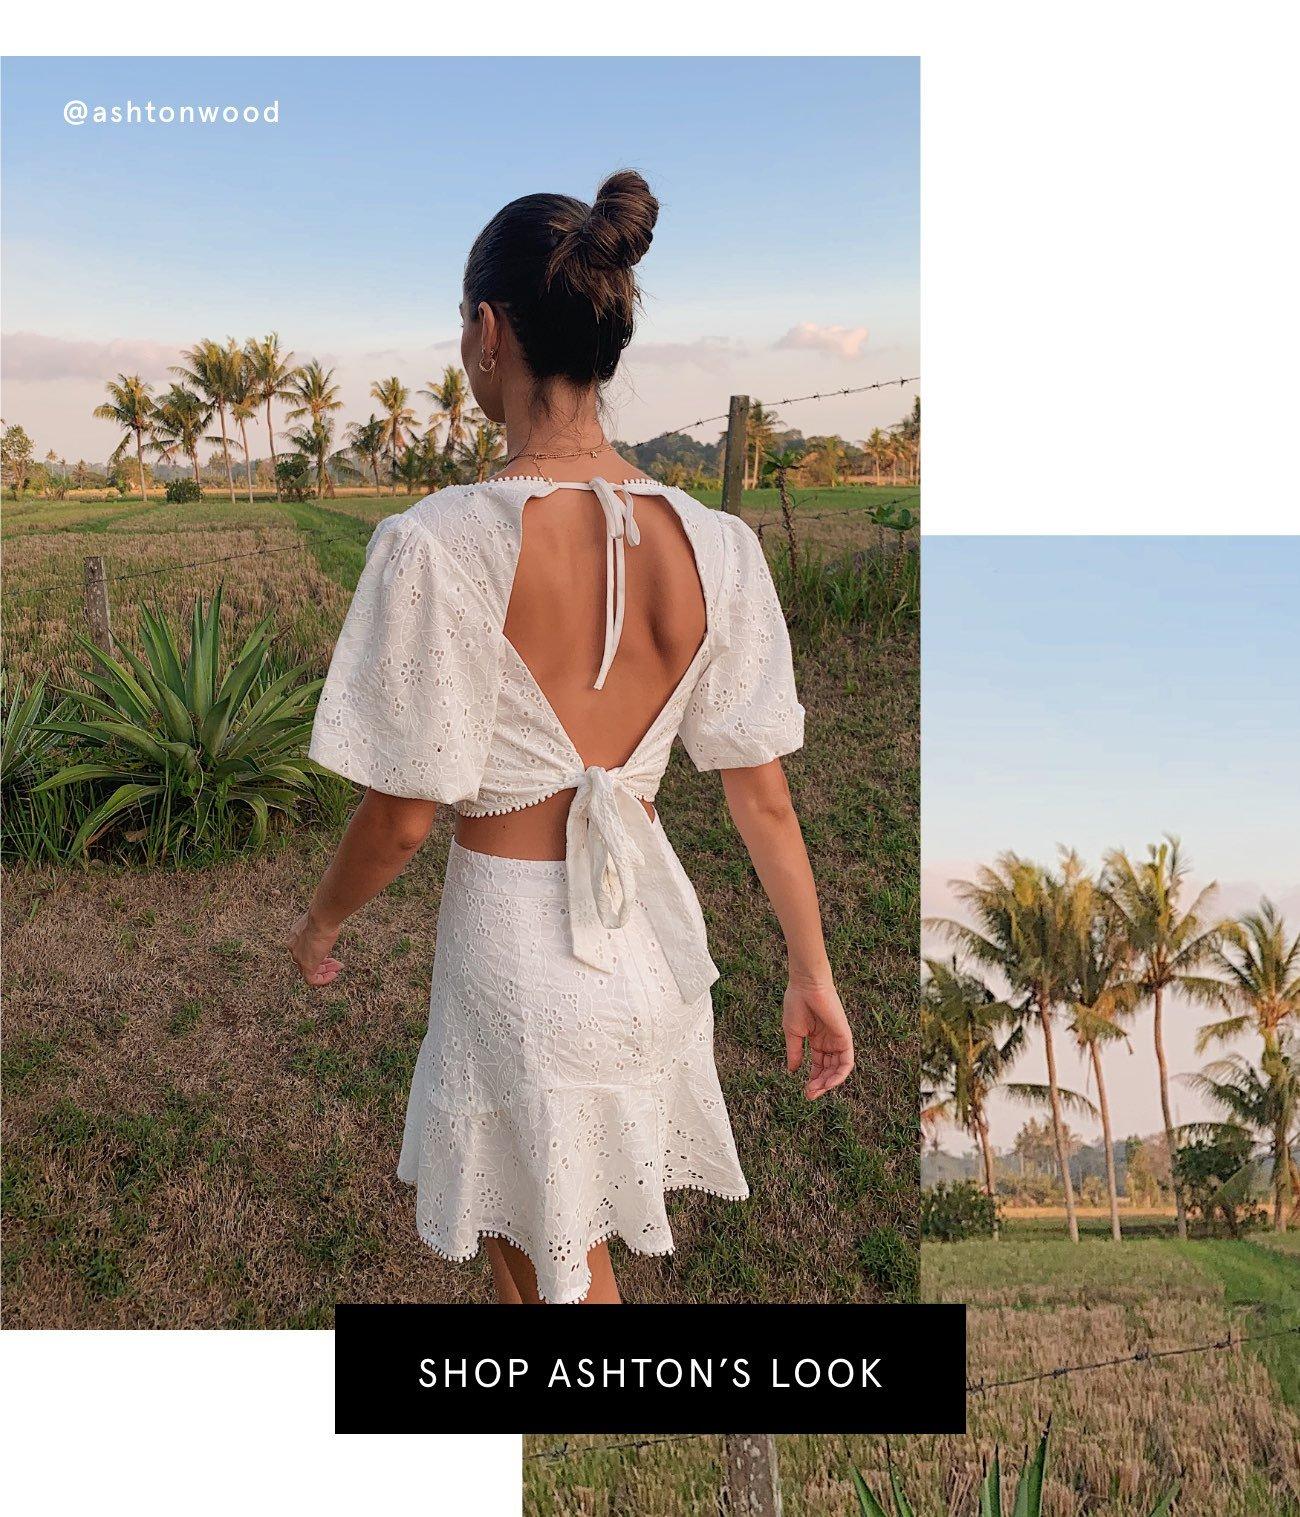 Shop Ashton's Look